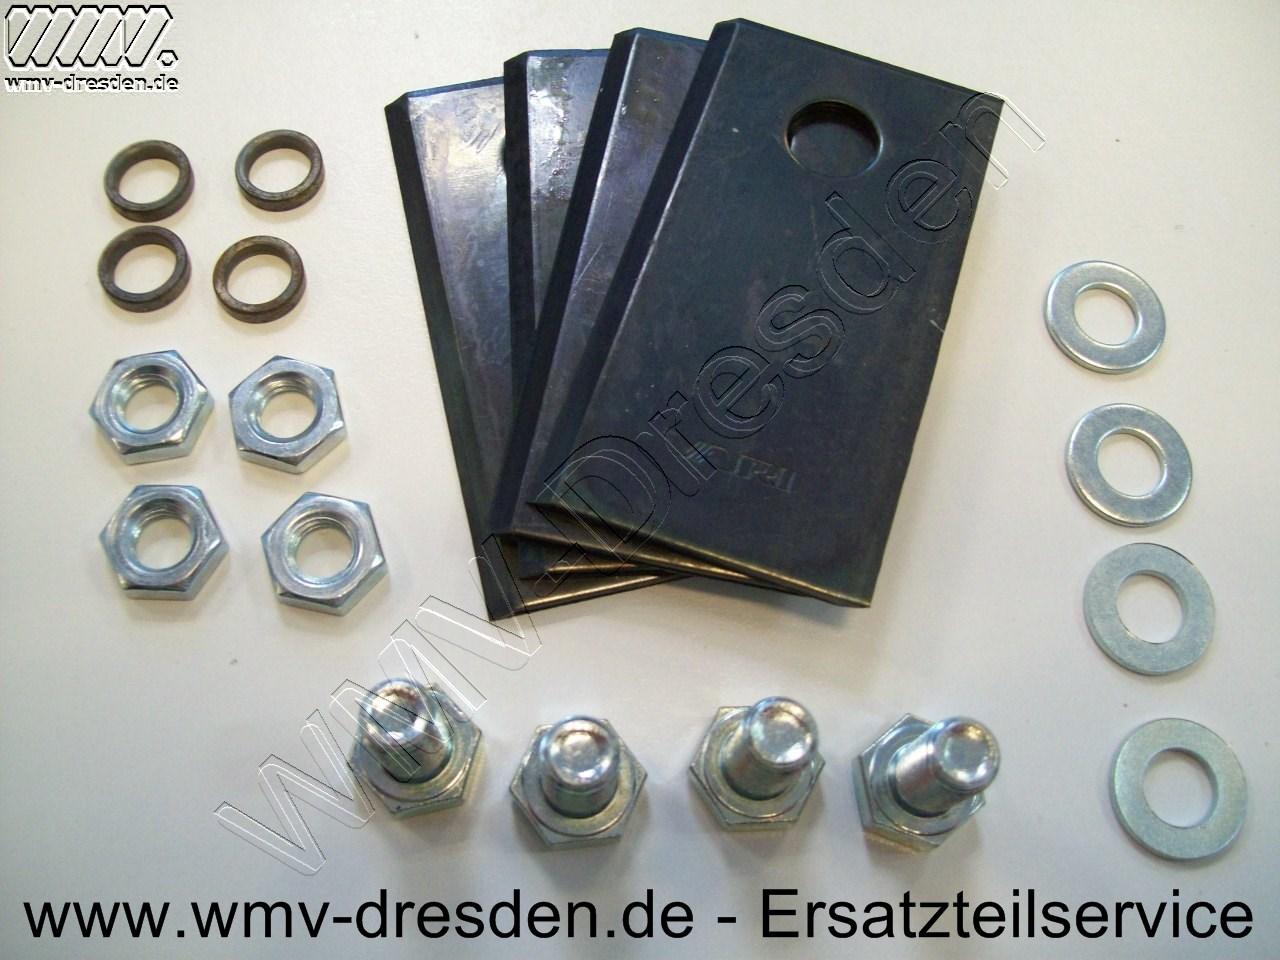 Messersatz  4 Klingen , 4  Sechskantschrauben 11517, Scheiben 11518, Muttern 11519, Zentrierhülsen 11460